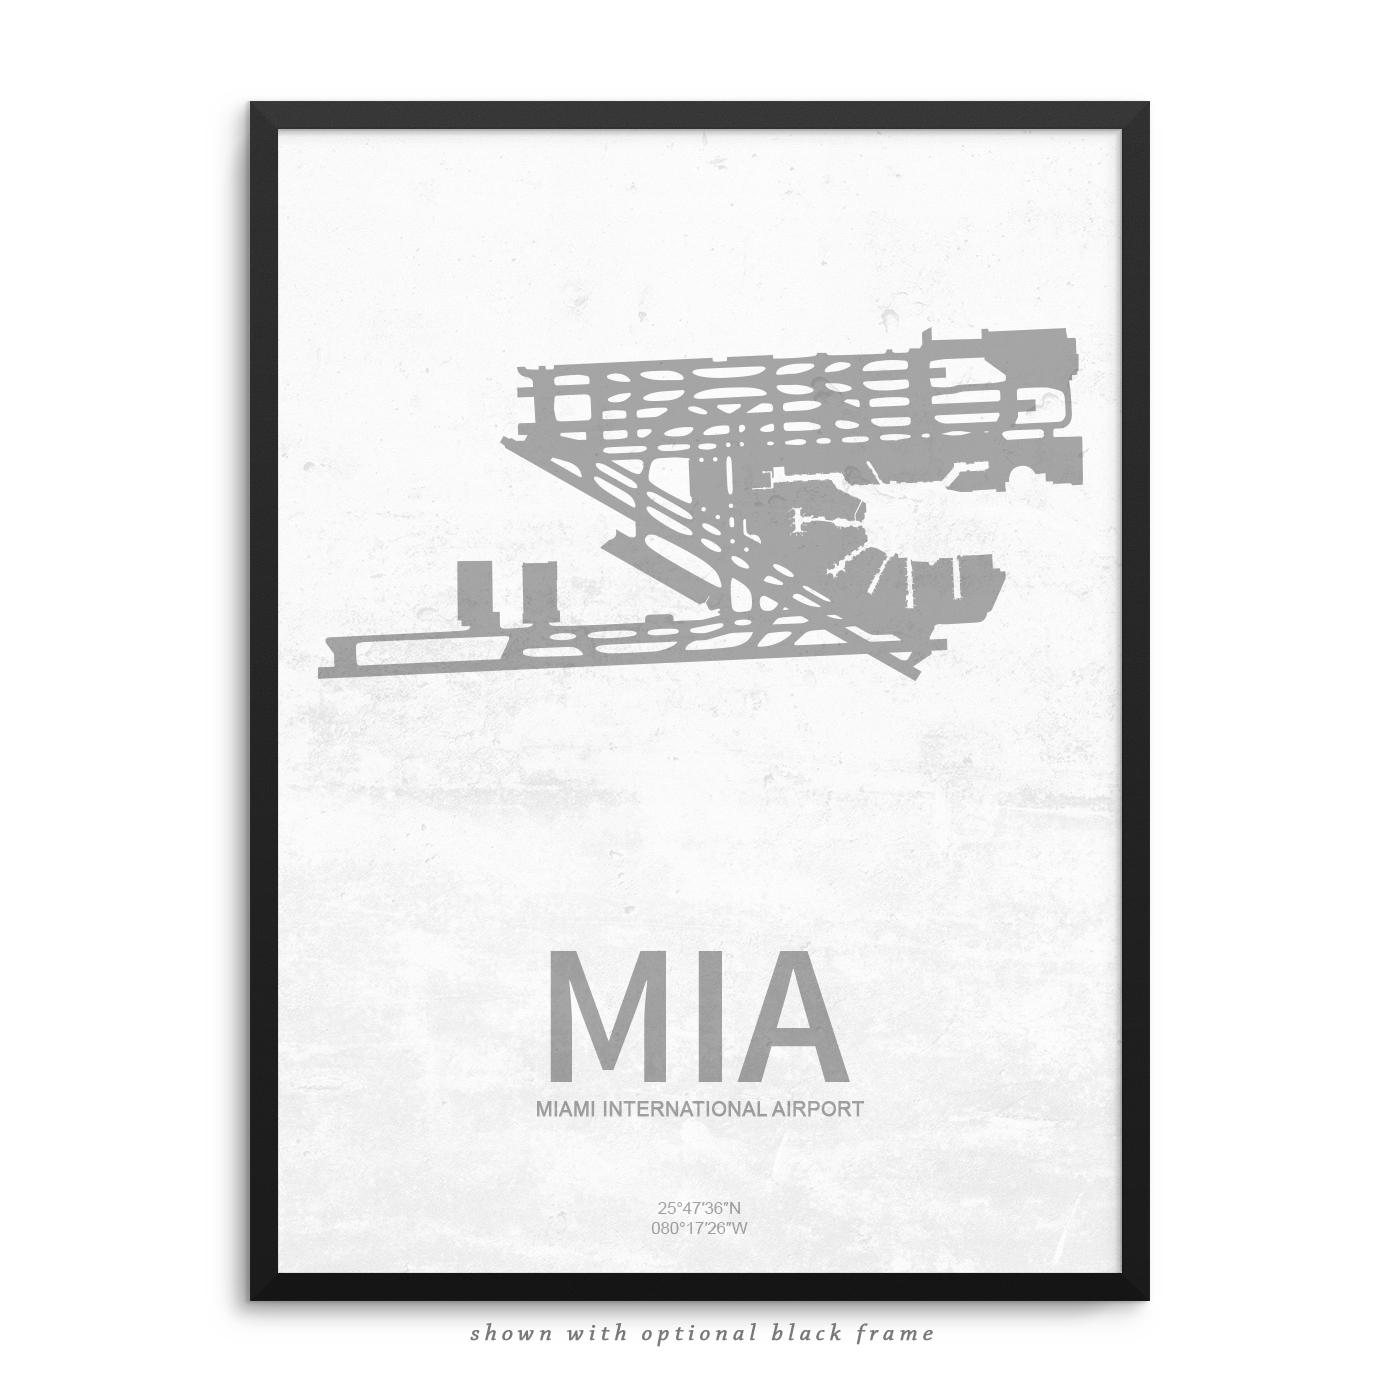 mia airport poster